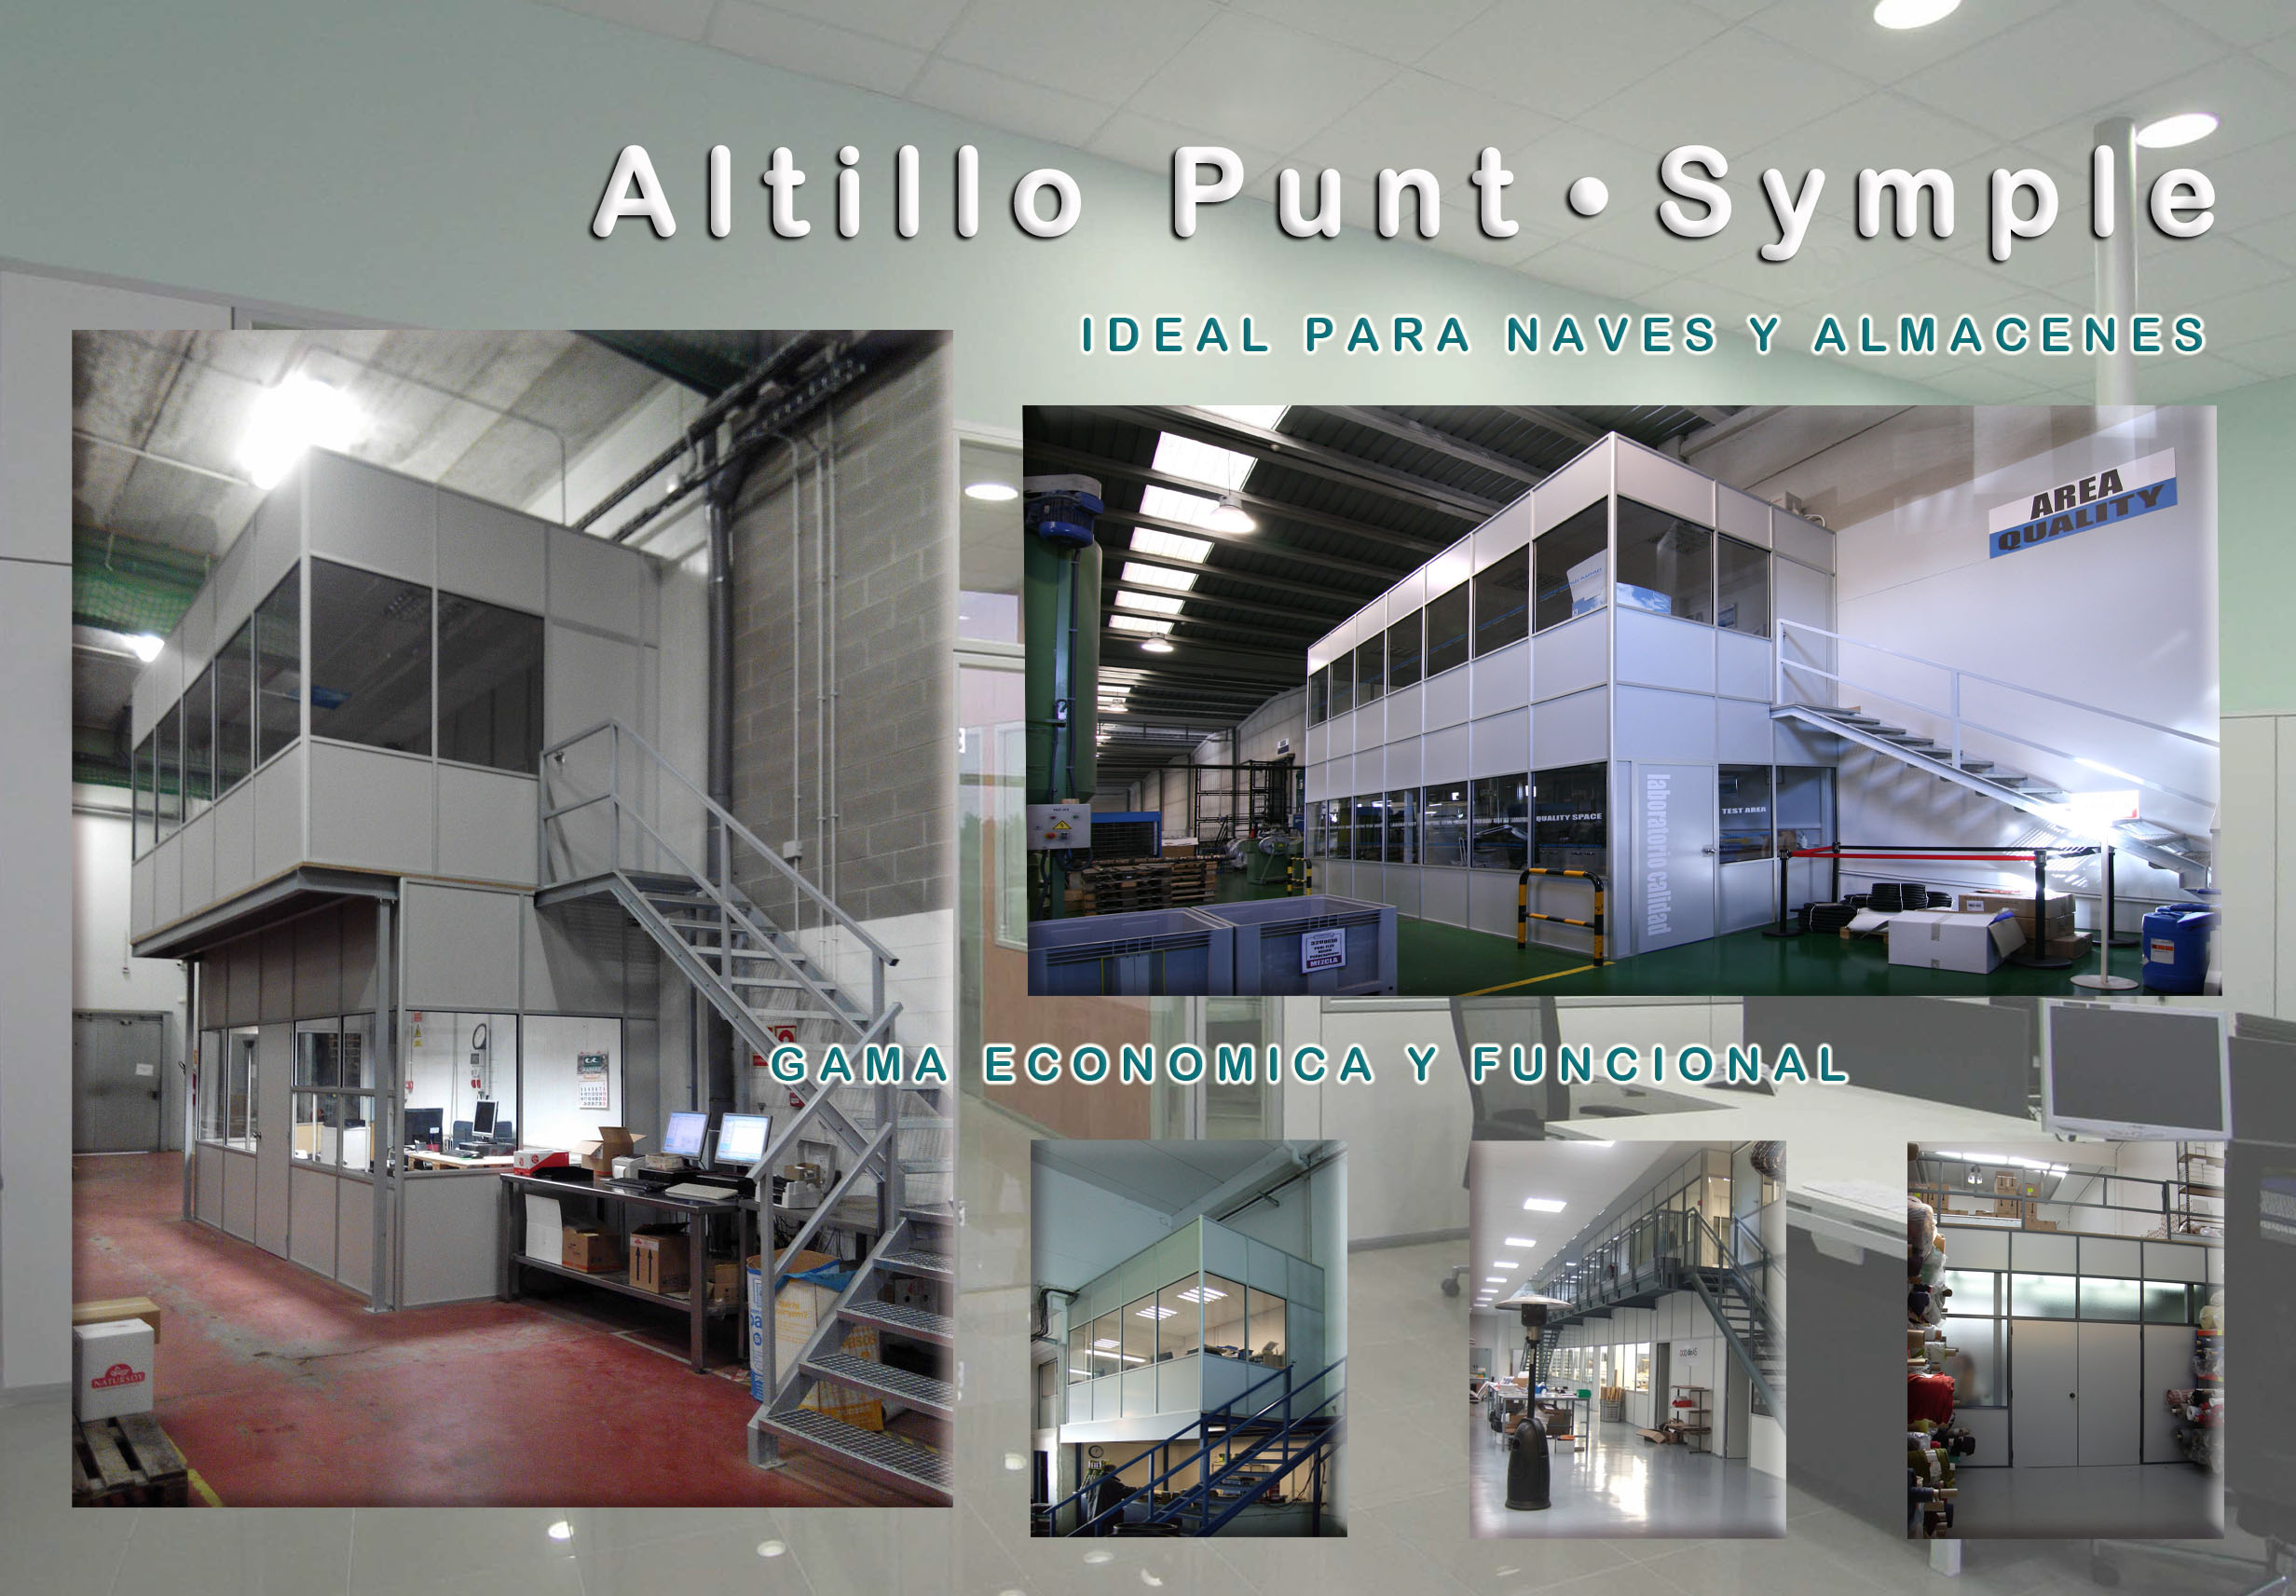 Punt - Asymple